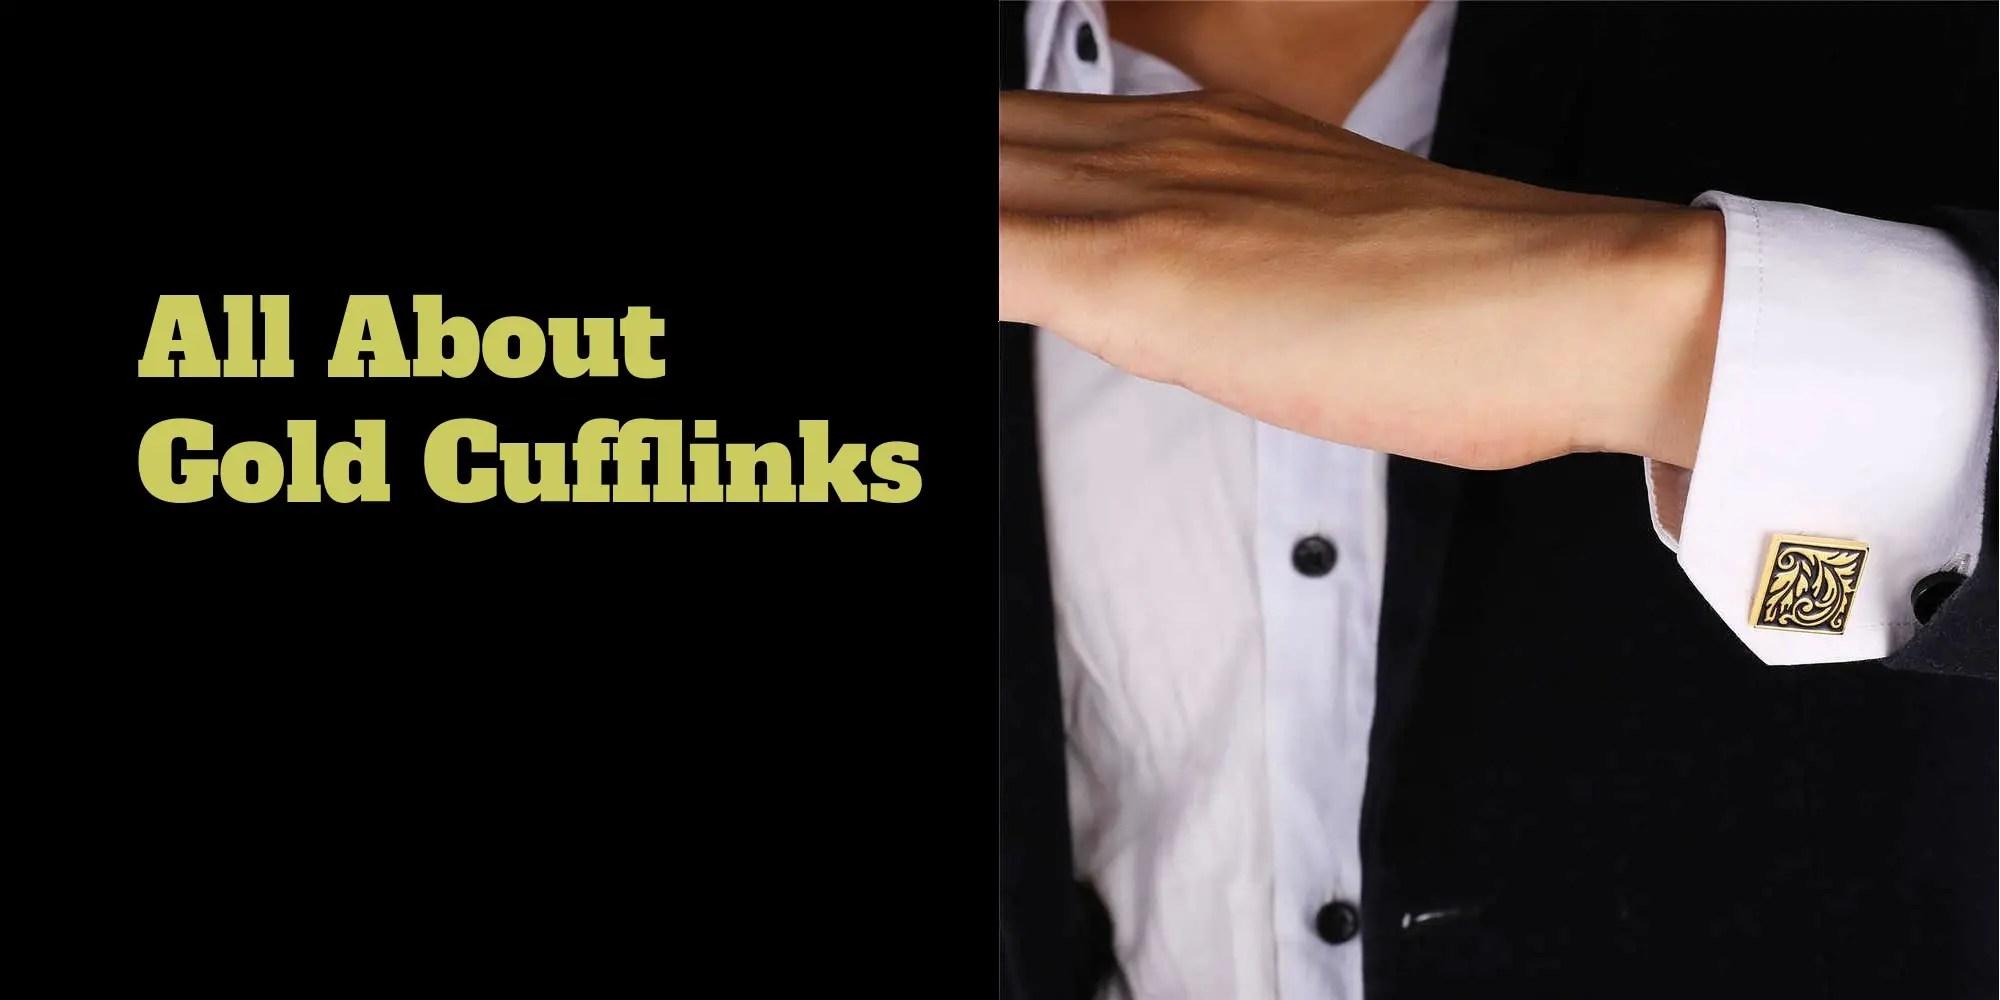 All About Gold Cufflinks